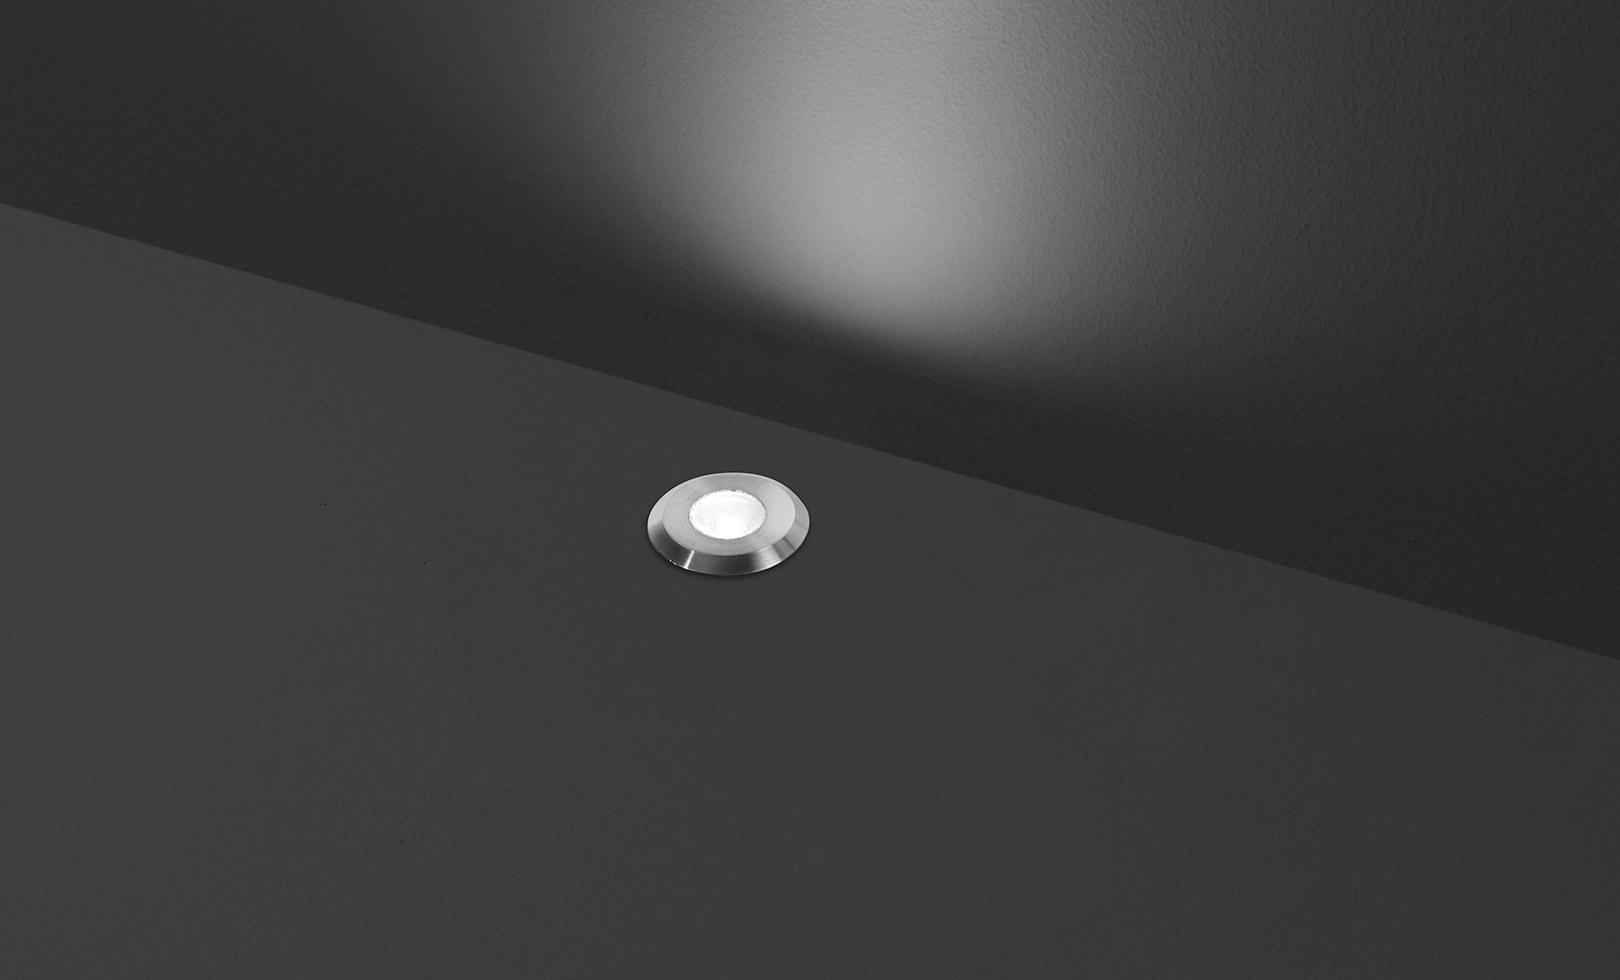 201001 HYDROFLOOR PICO LED 1W 1